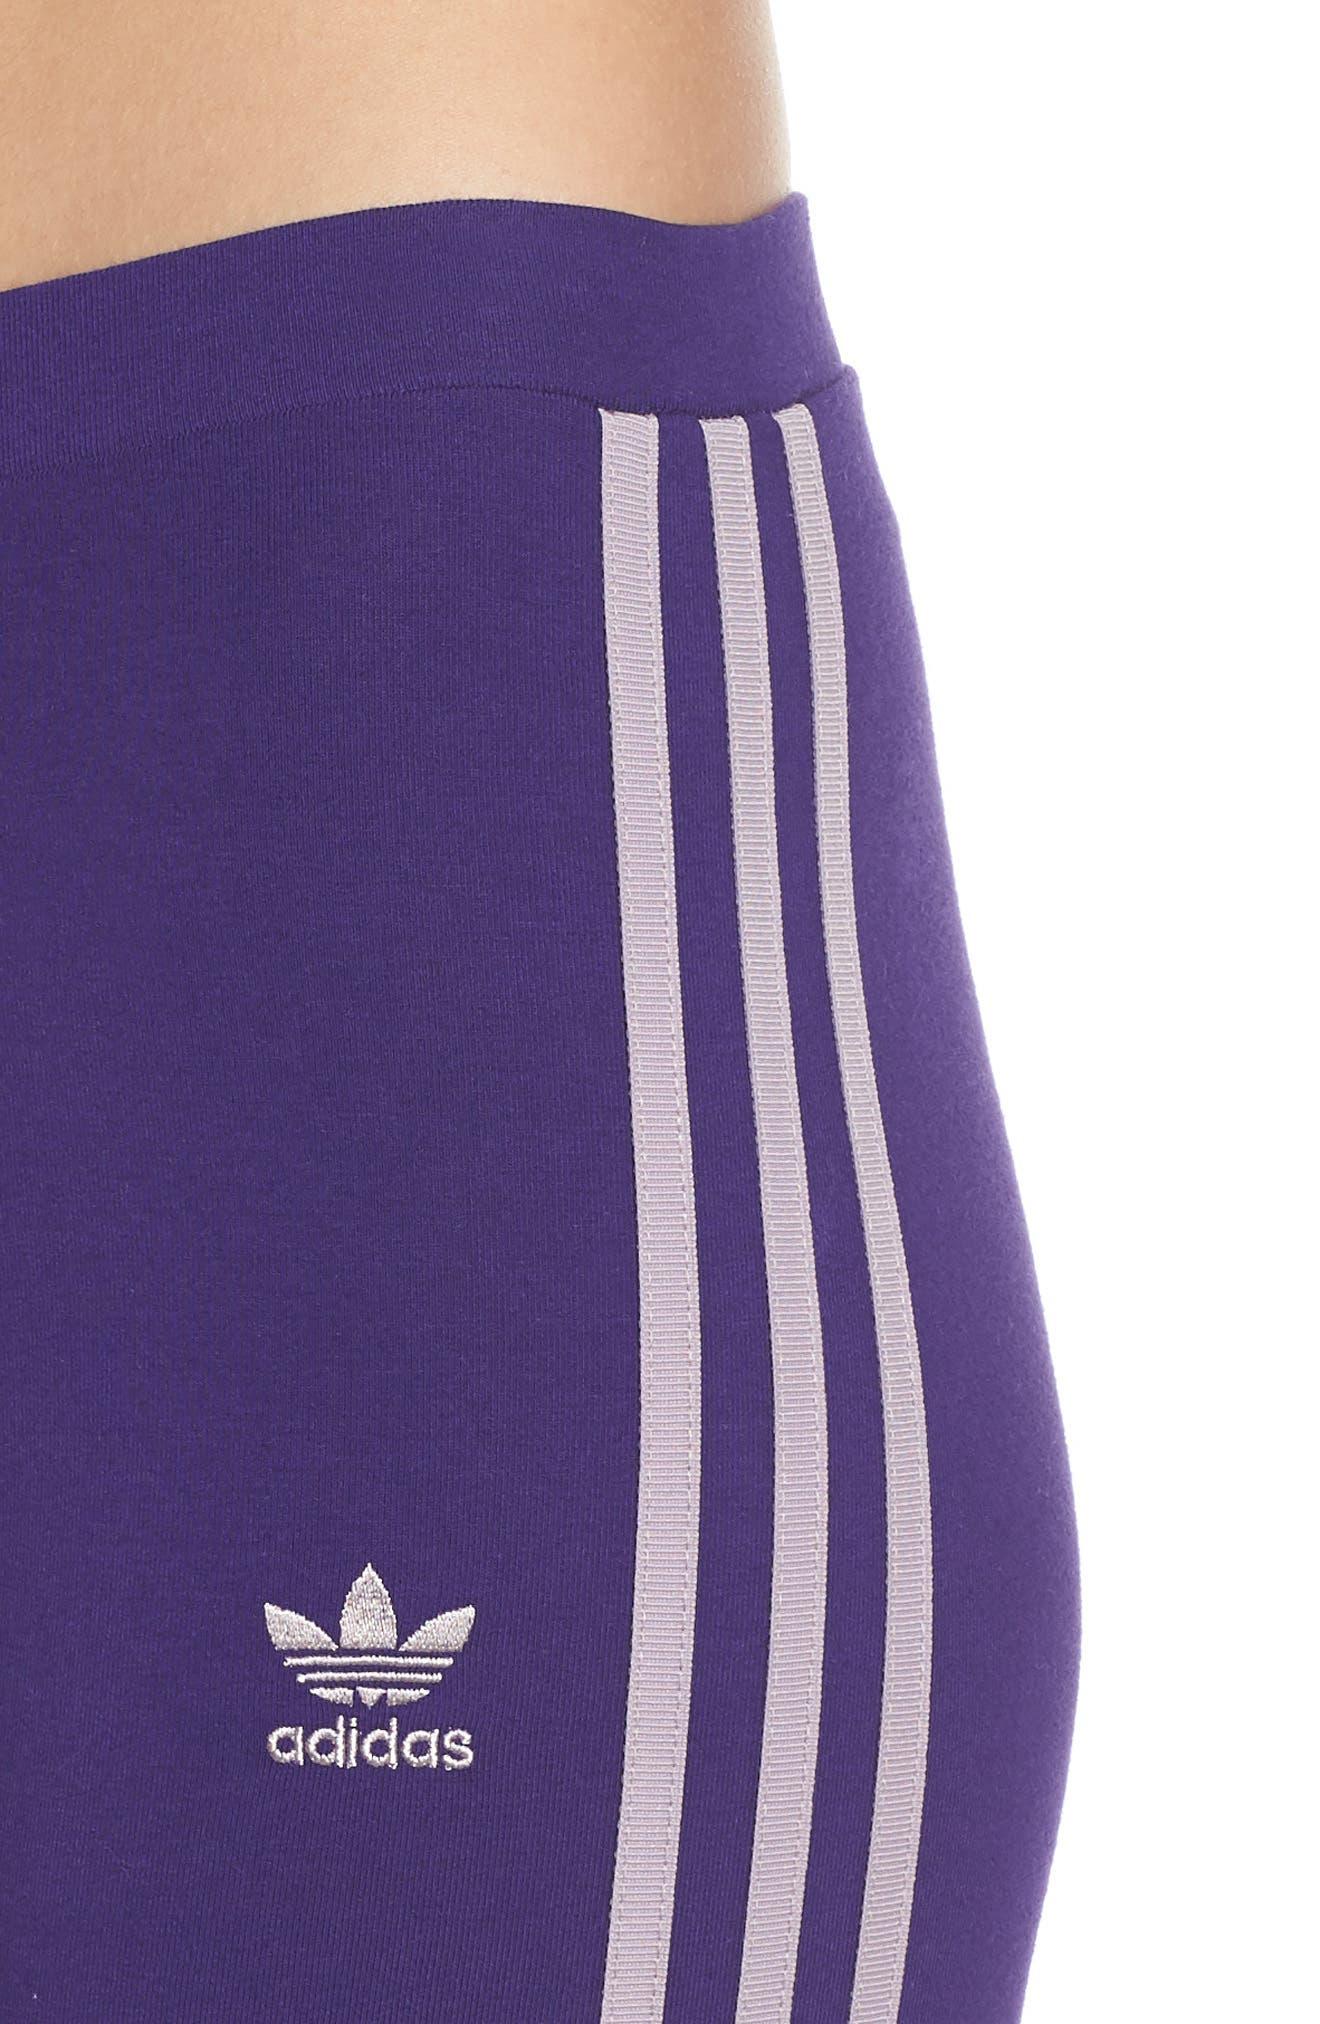 ,                             adidas 3-Stripes Tights,                             Alternate thumbnail 41, color,                             500